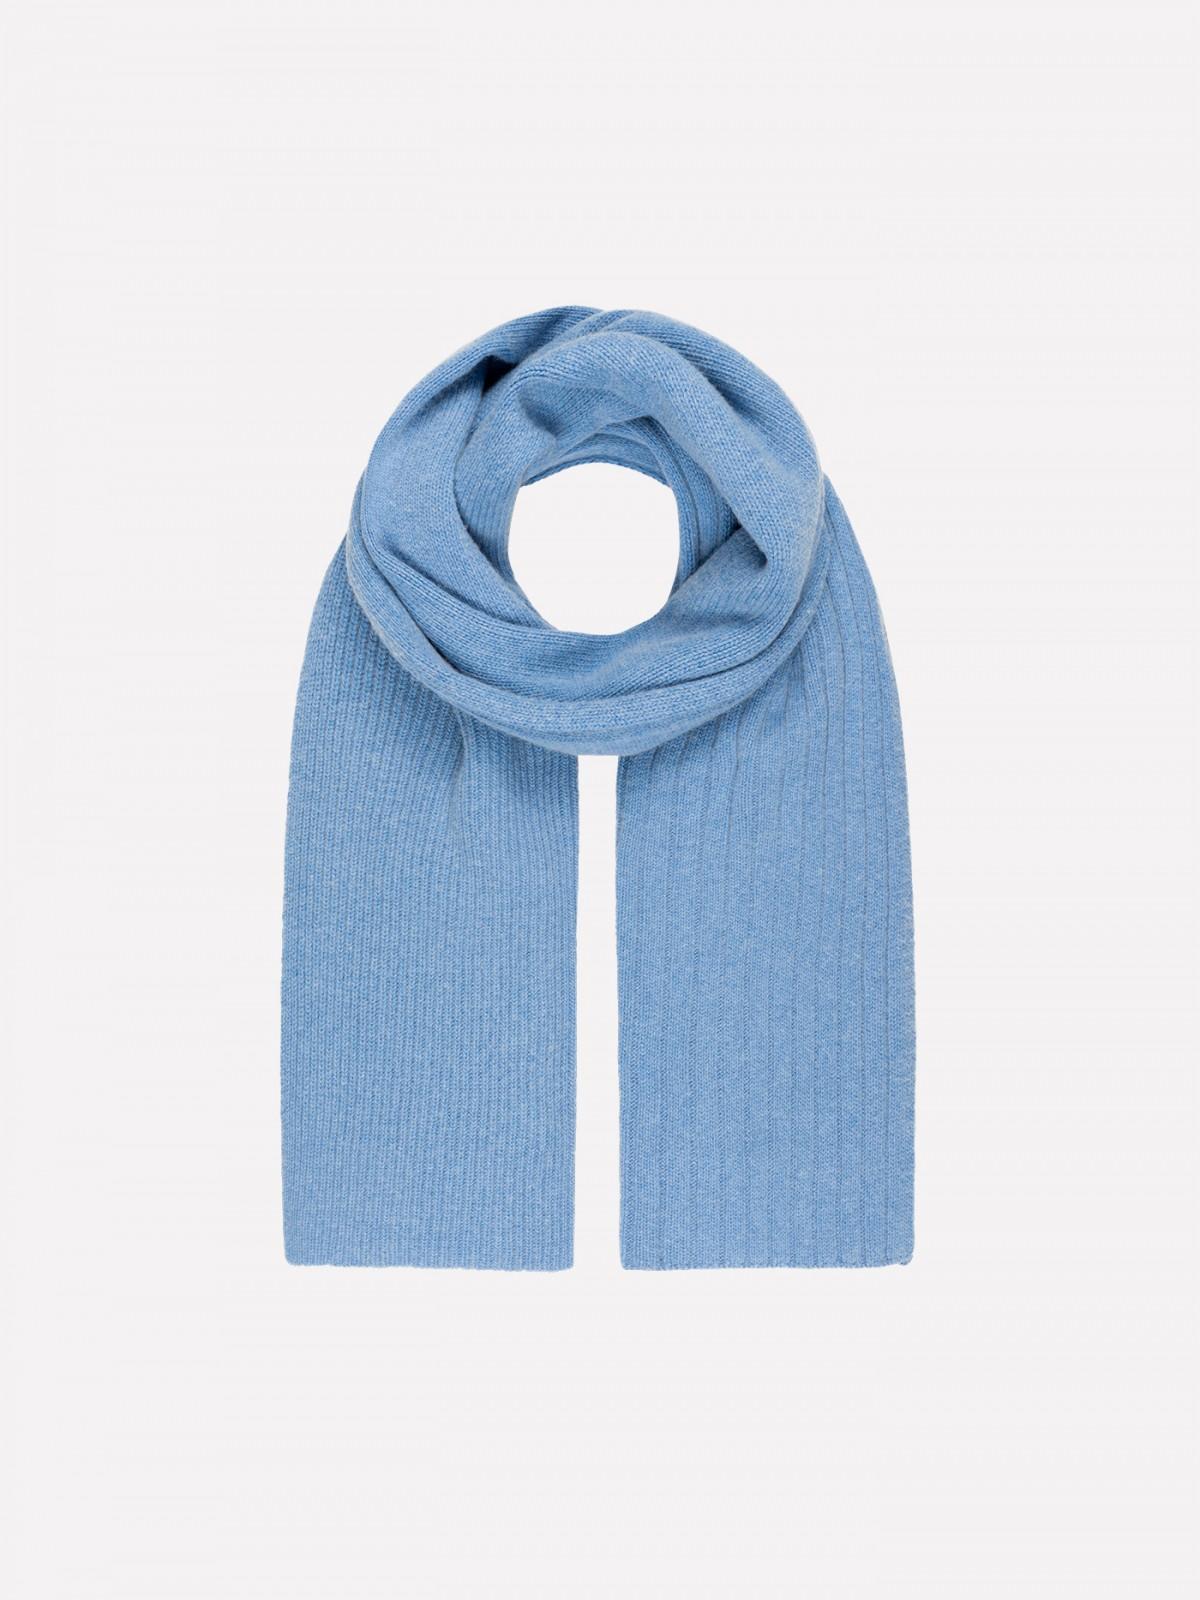 Coarse knit organic virgin wool and organic cotton scarf